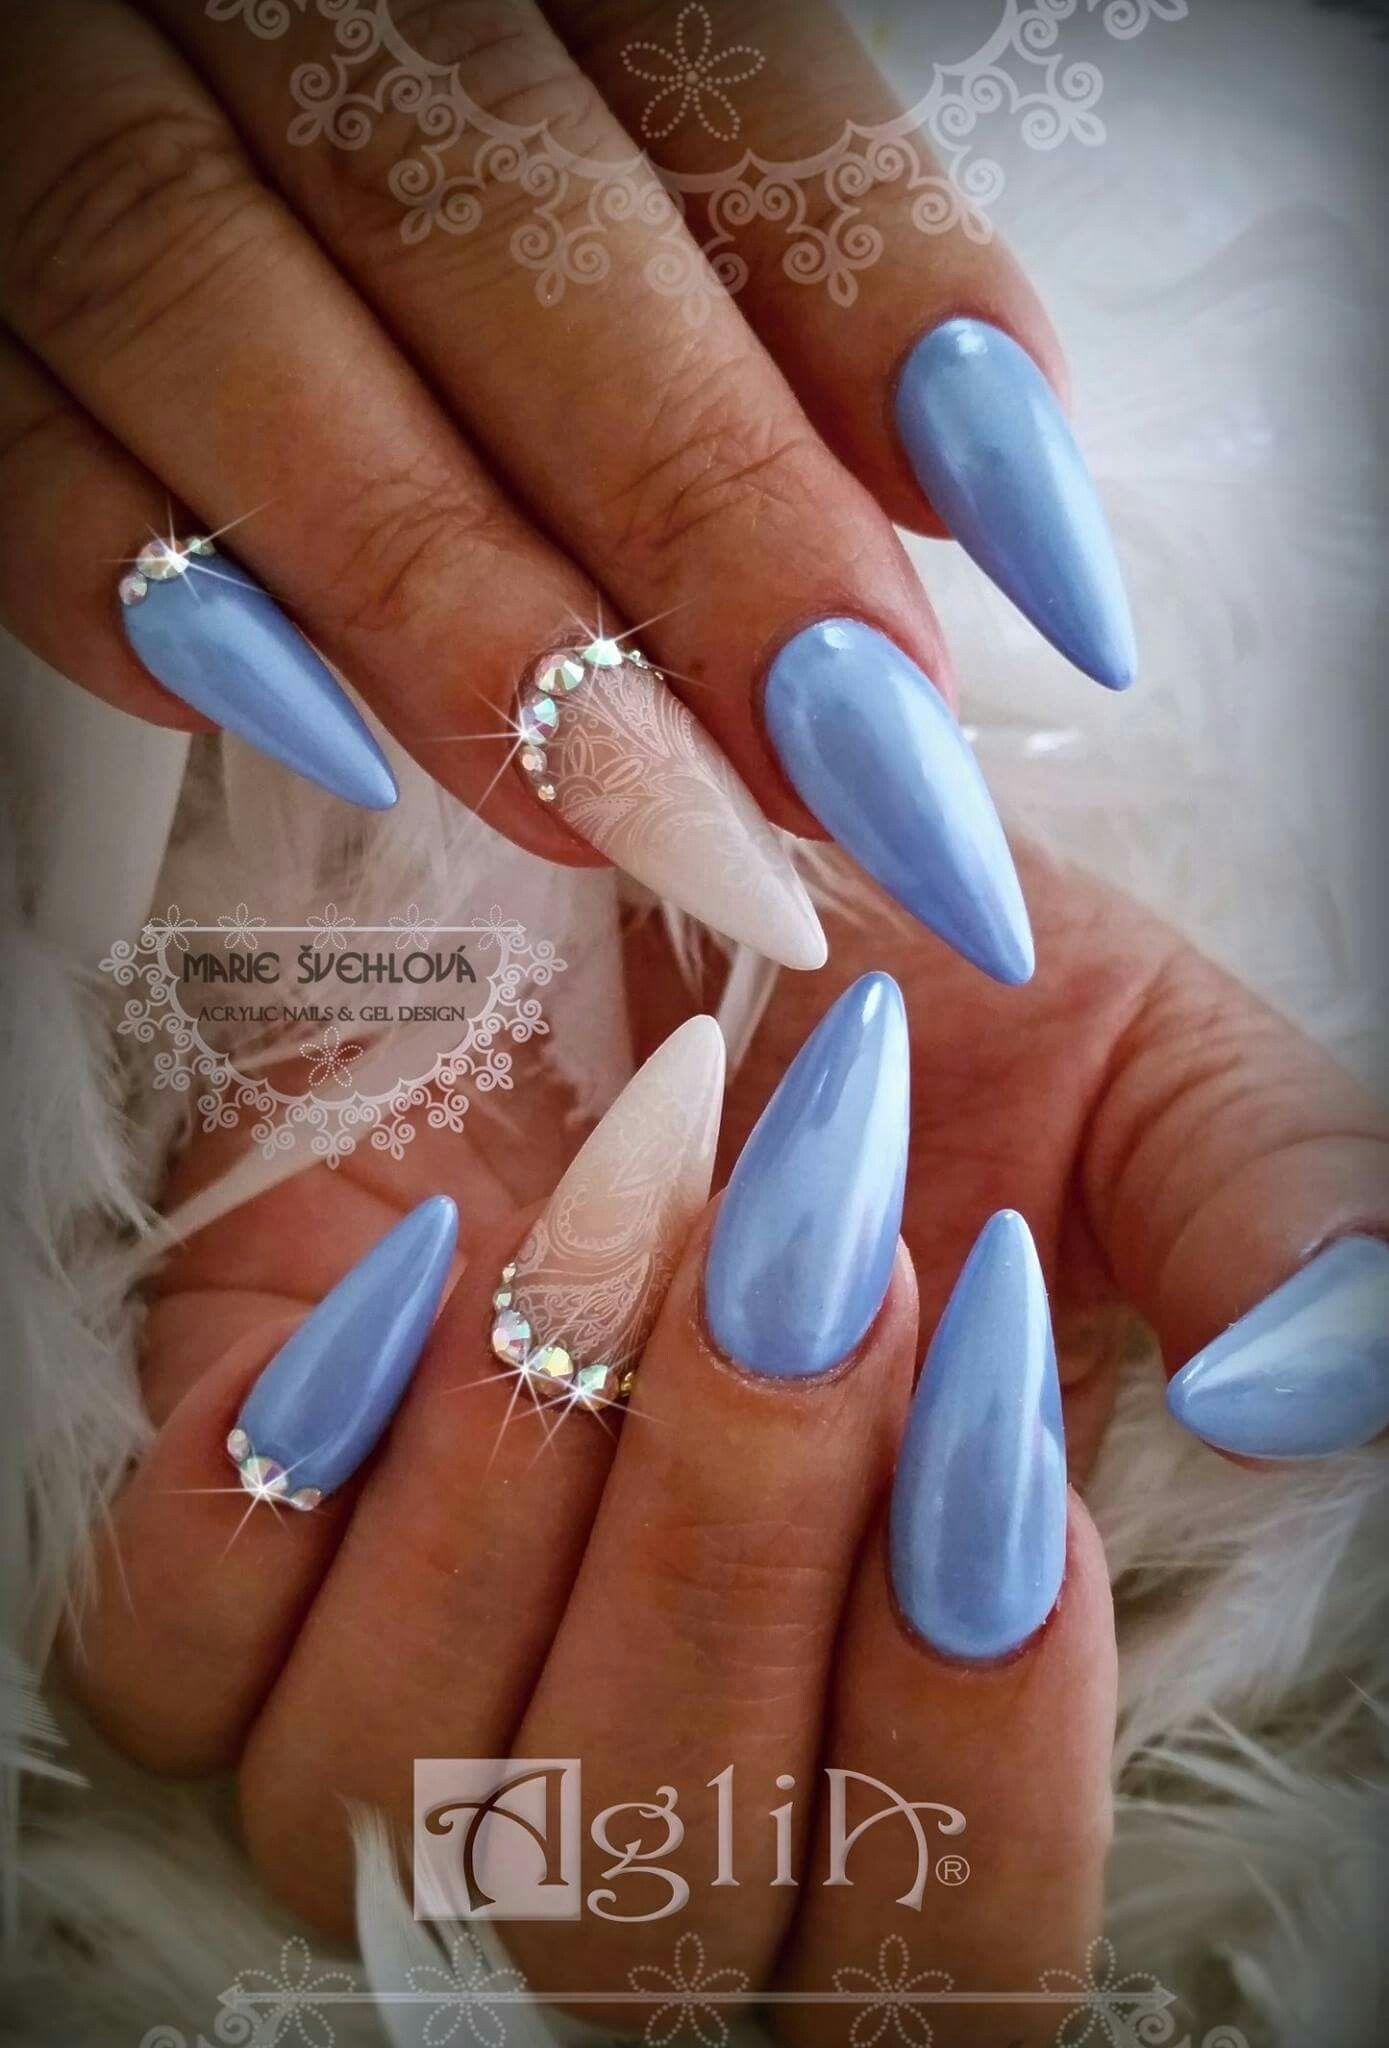 Acrylic Nails Gel Design Blue Nails Design Nehtu Nehty Design